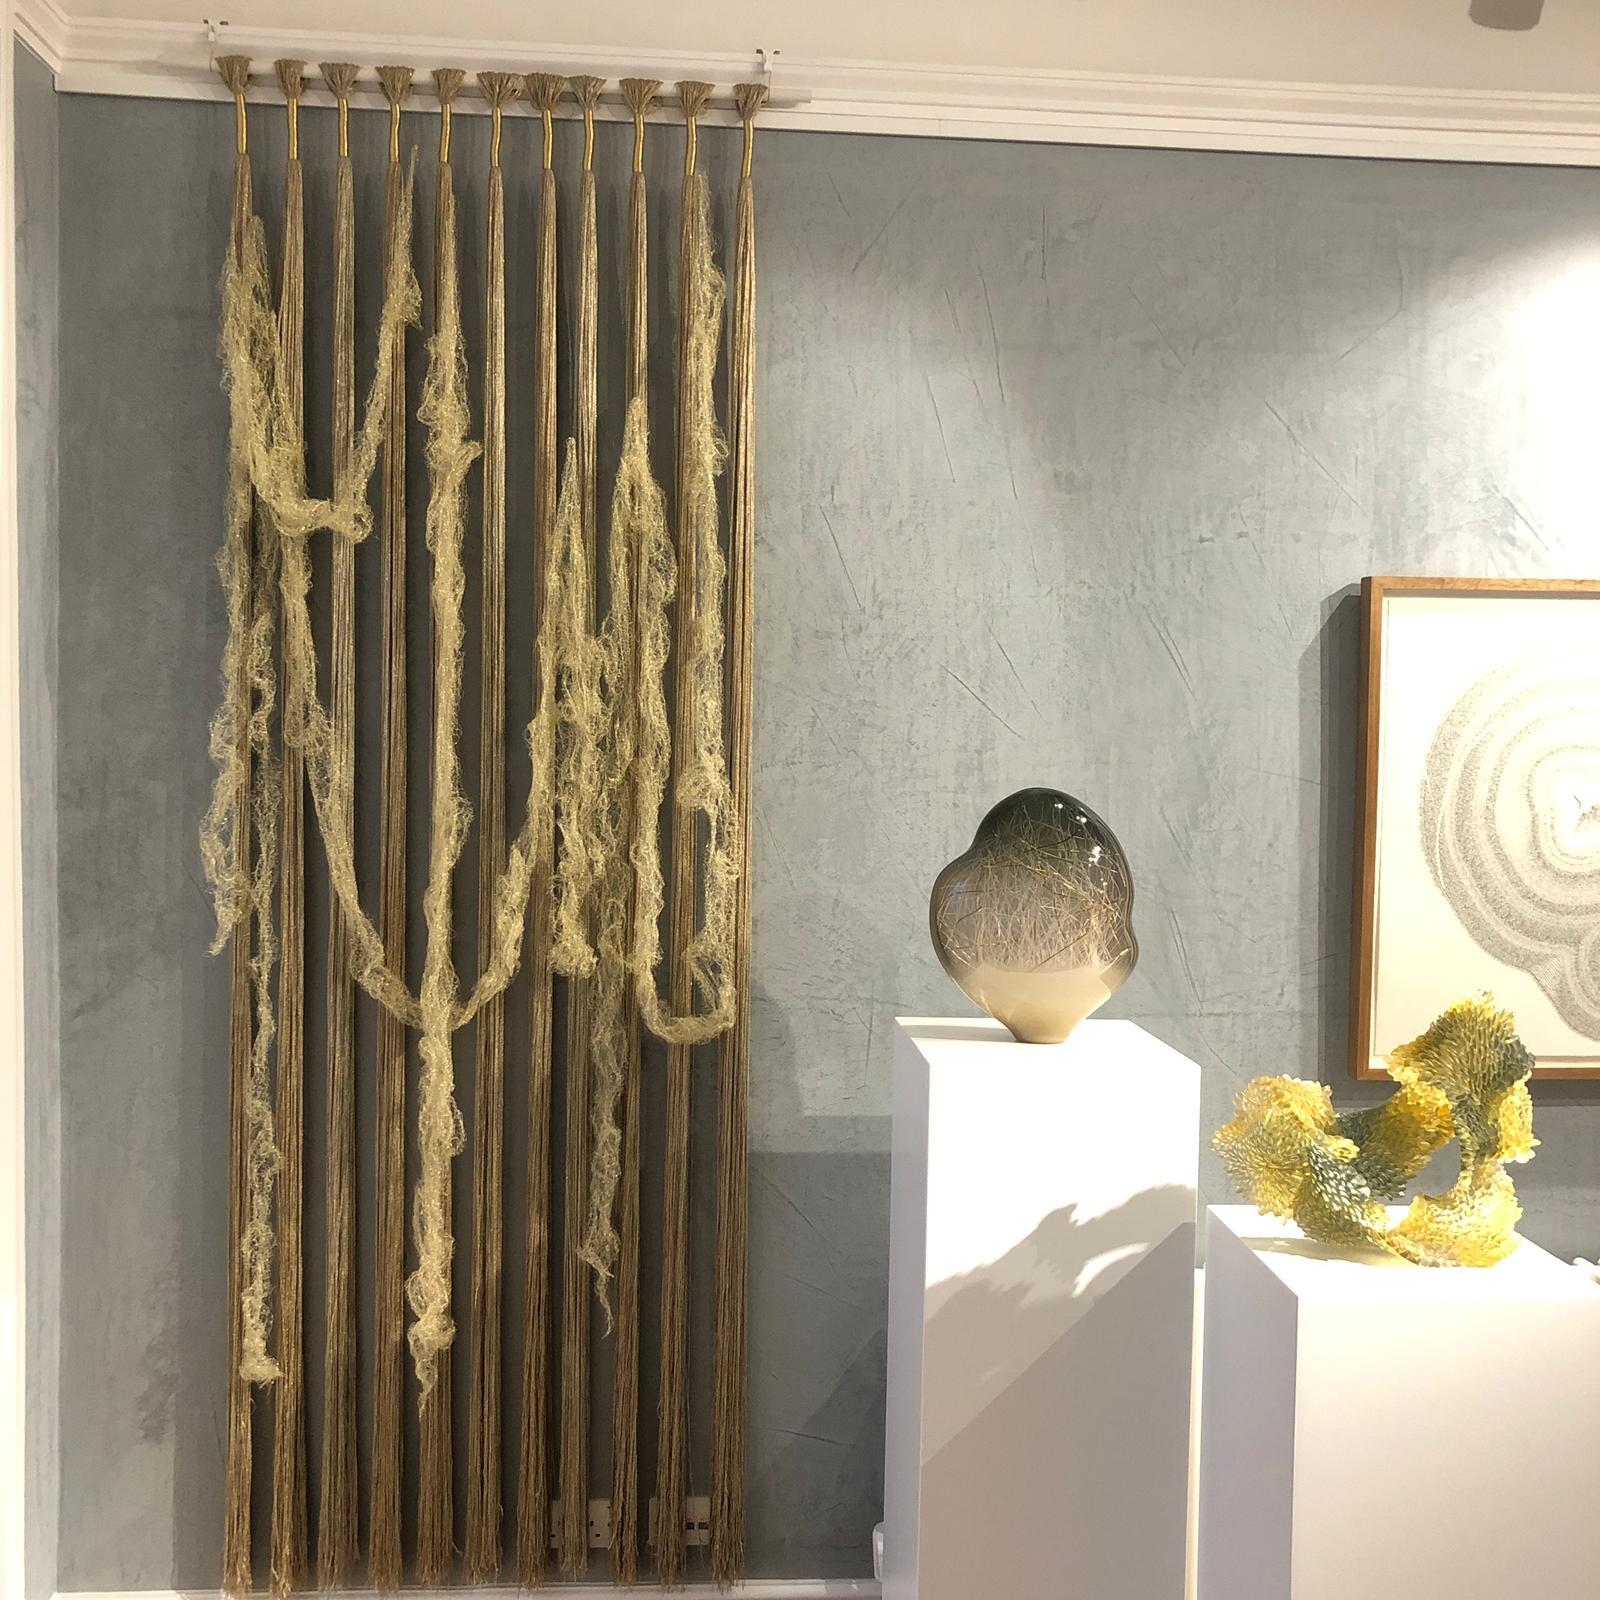 Gallery SoShiro 2021, London